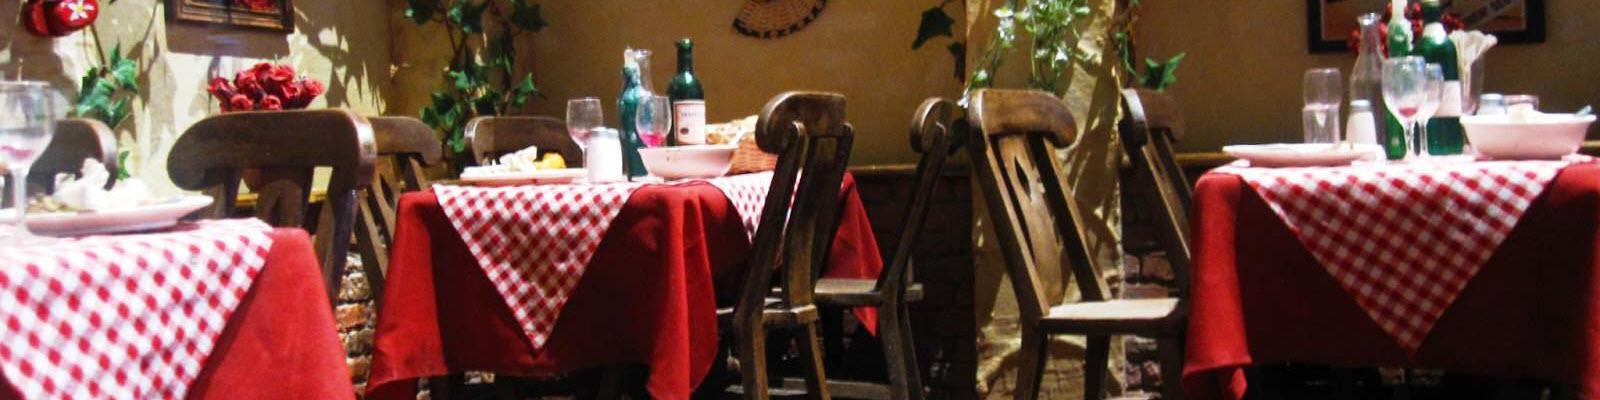 Ethnic restaurant decor